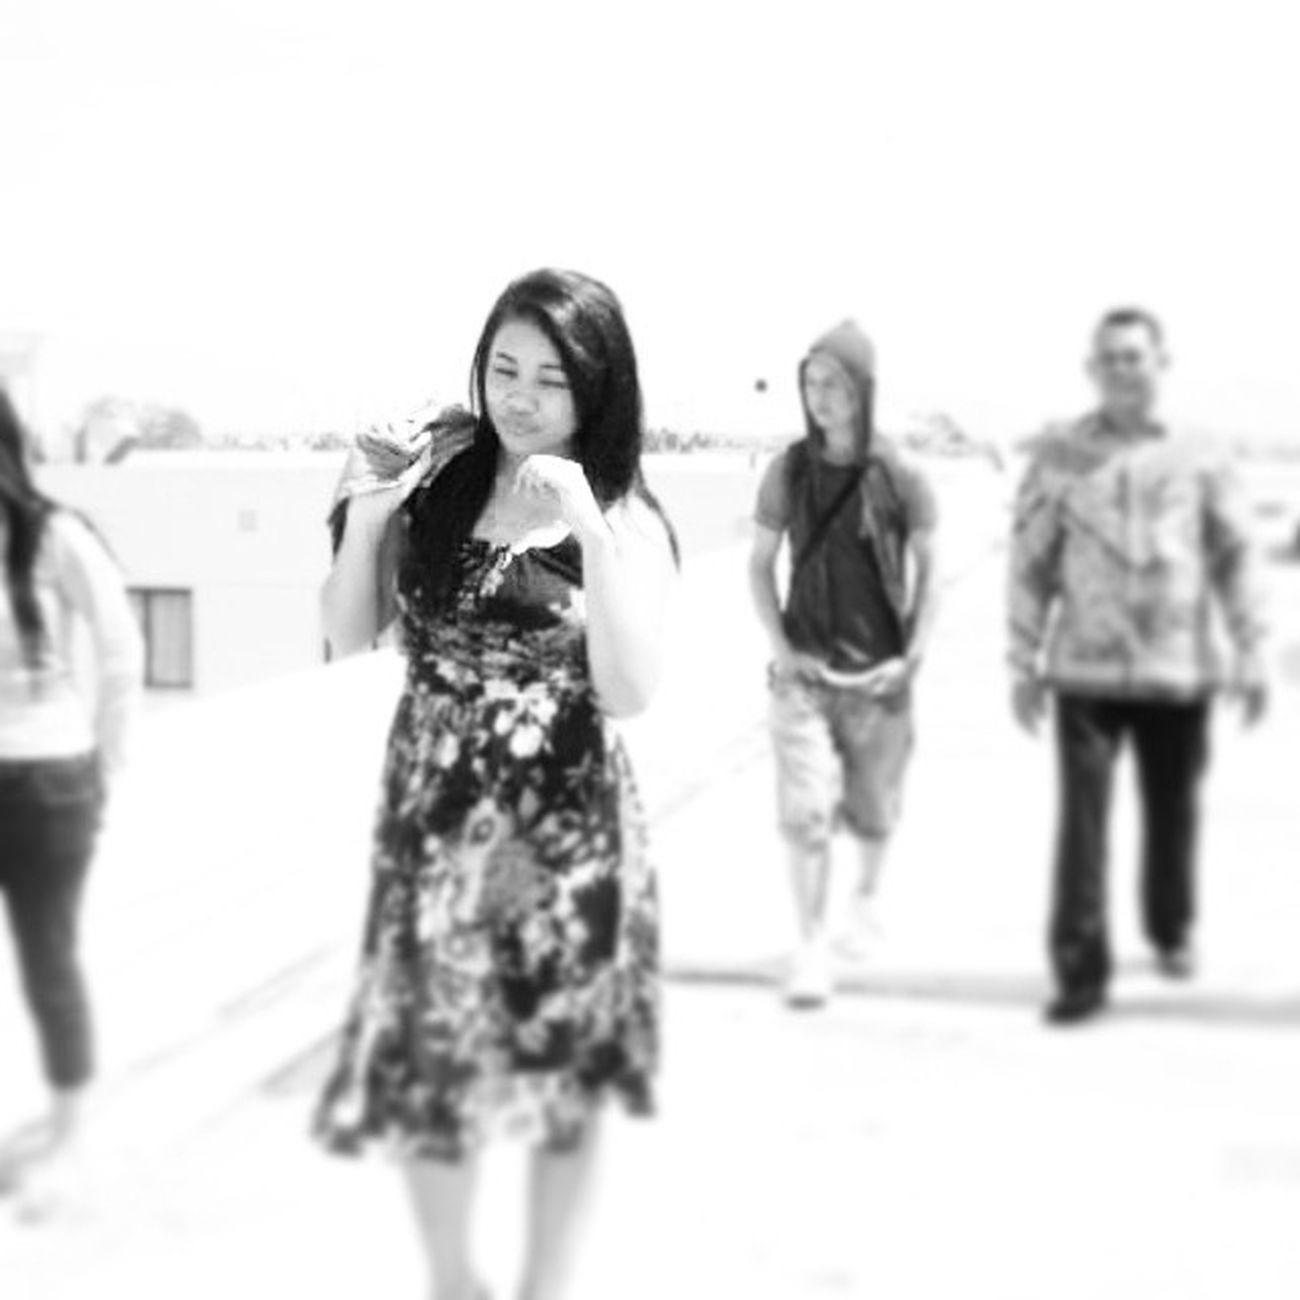 Throwback Aceh2010 Gayalo Kebanyakangaya lagidemenpakedress diblacklistdracehgaragaragelut That's Me Blackandwhite Photography Monochrome Lhokseumawe Tsunami2004